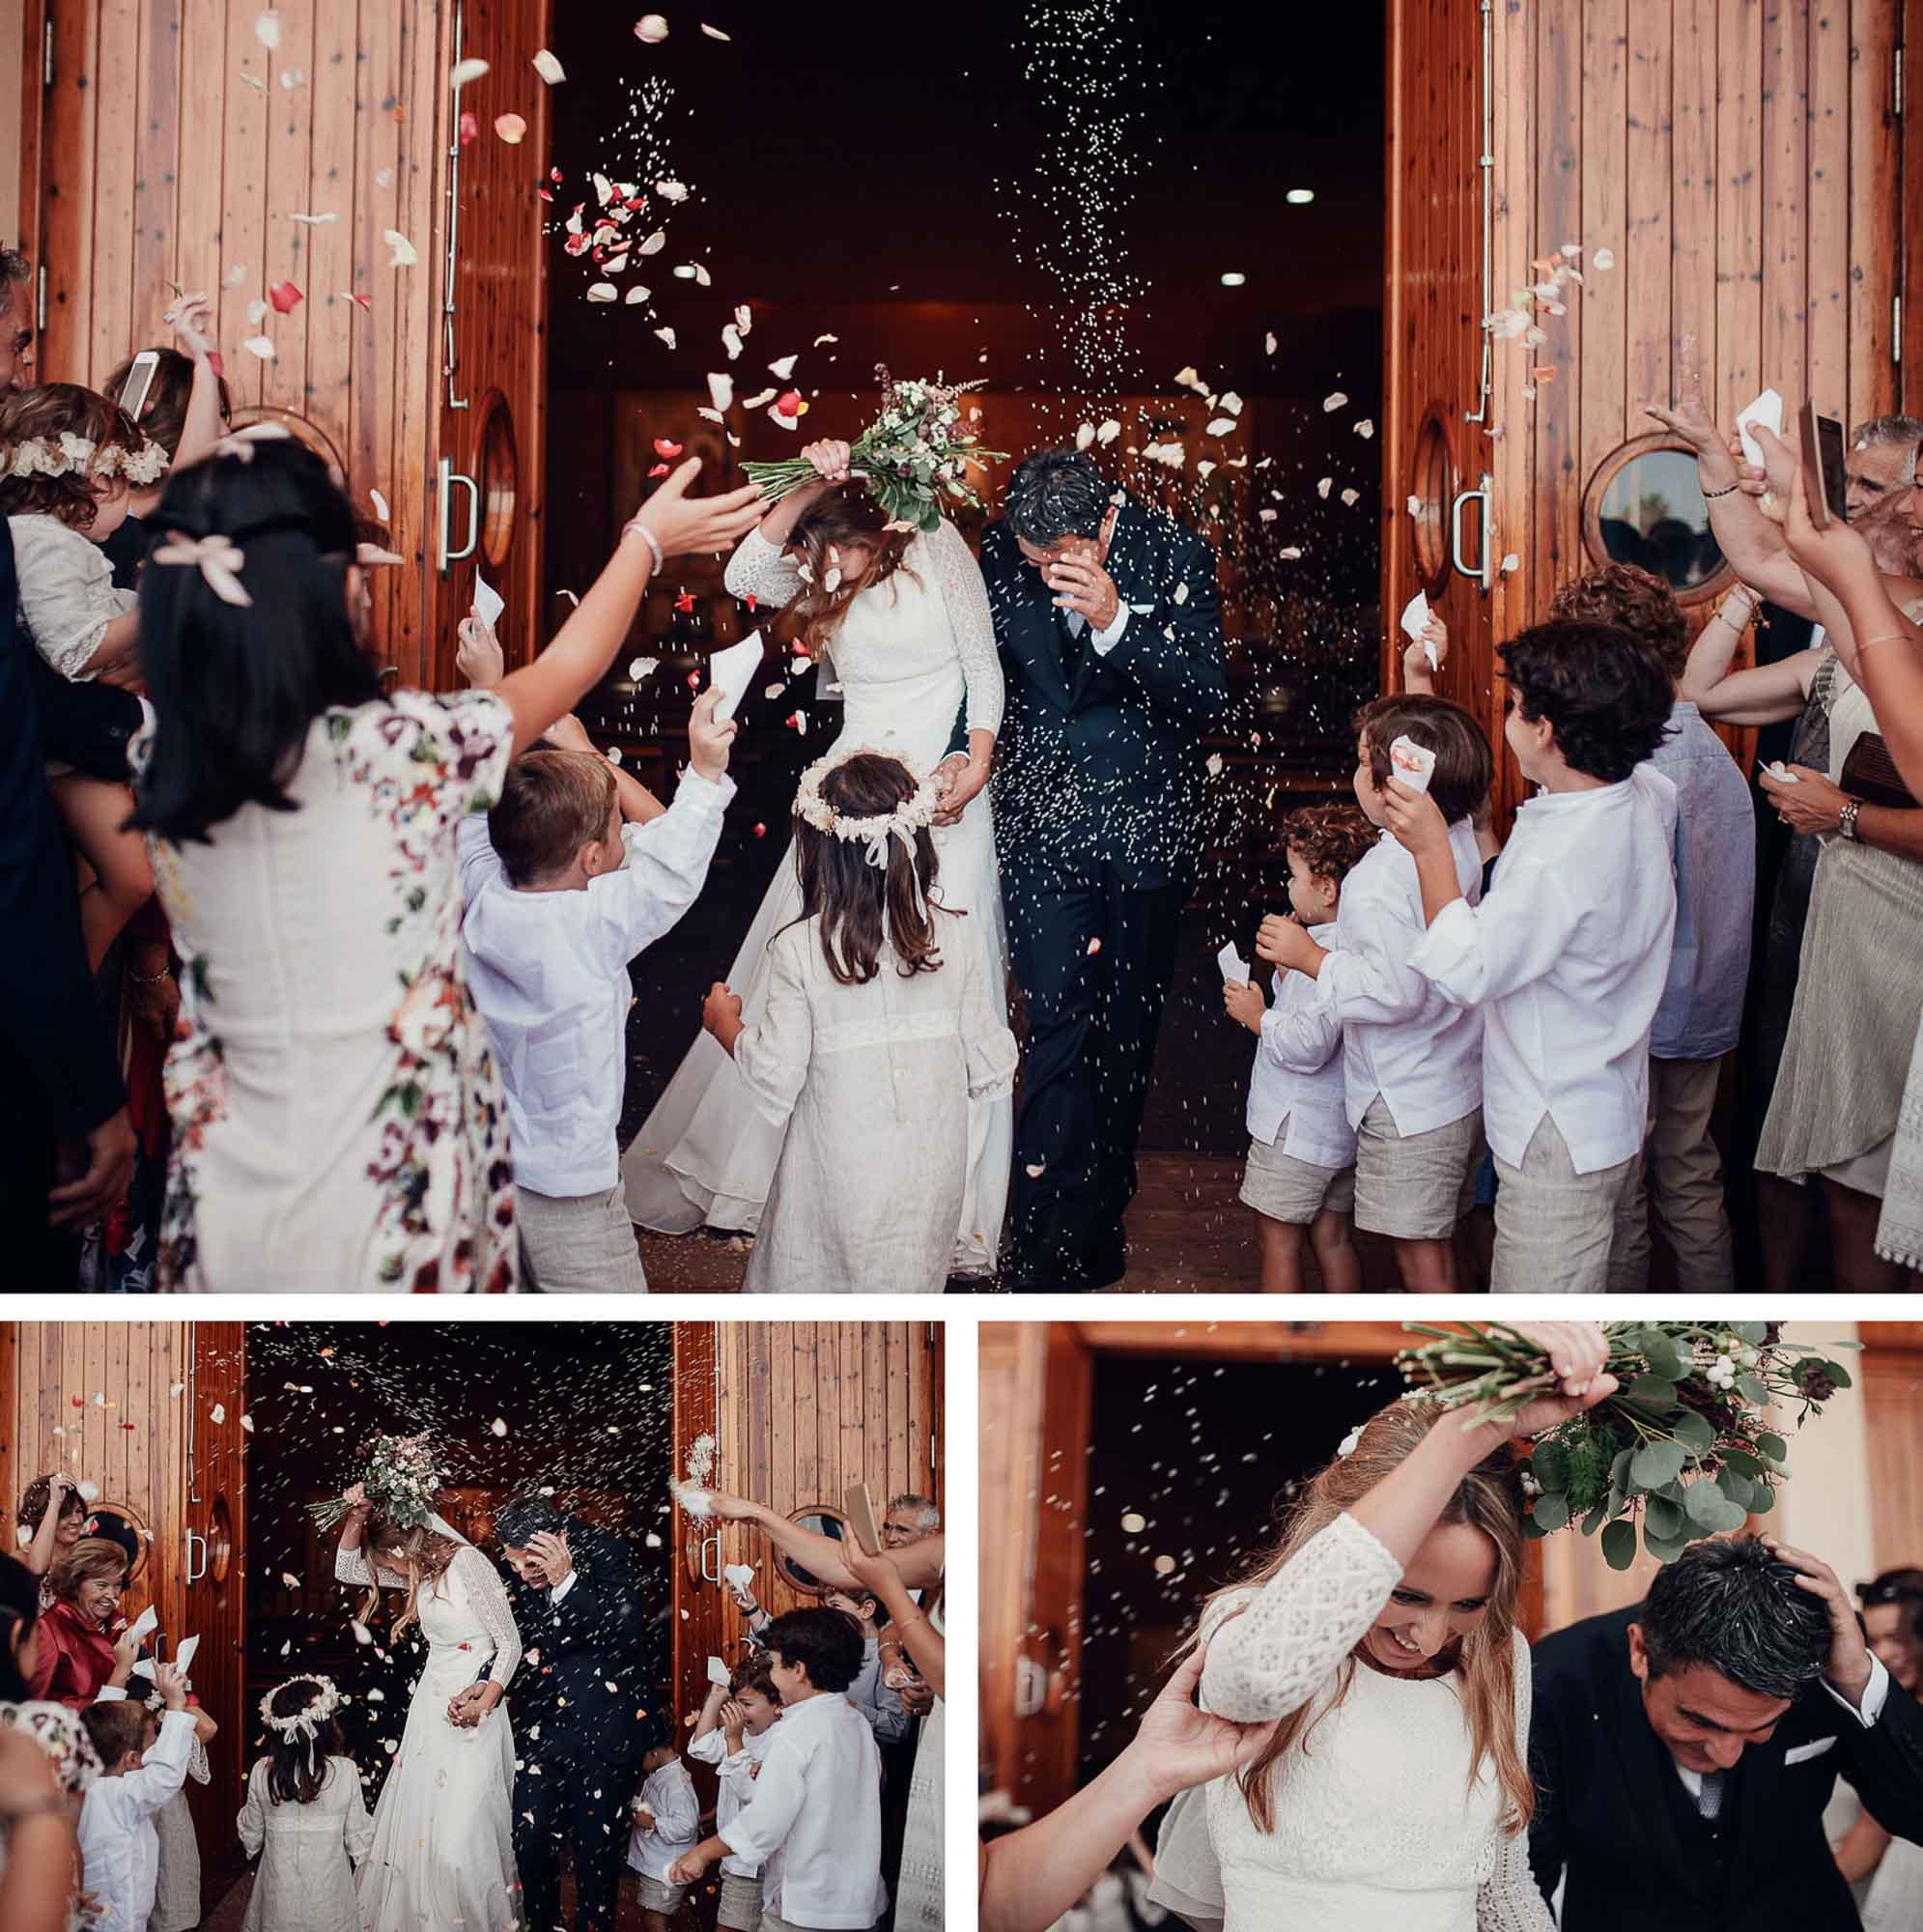 salida iglesia boda ramo arroz flores novios cabo de palos invitados fotografia